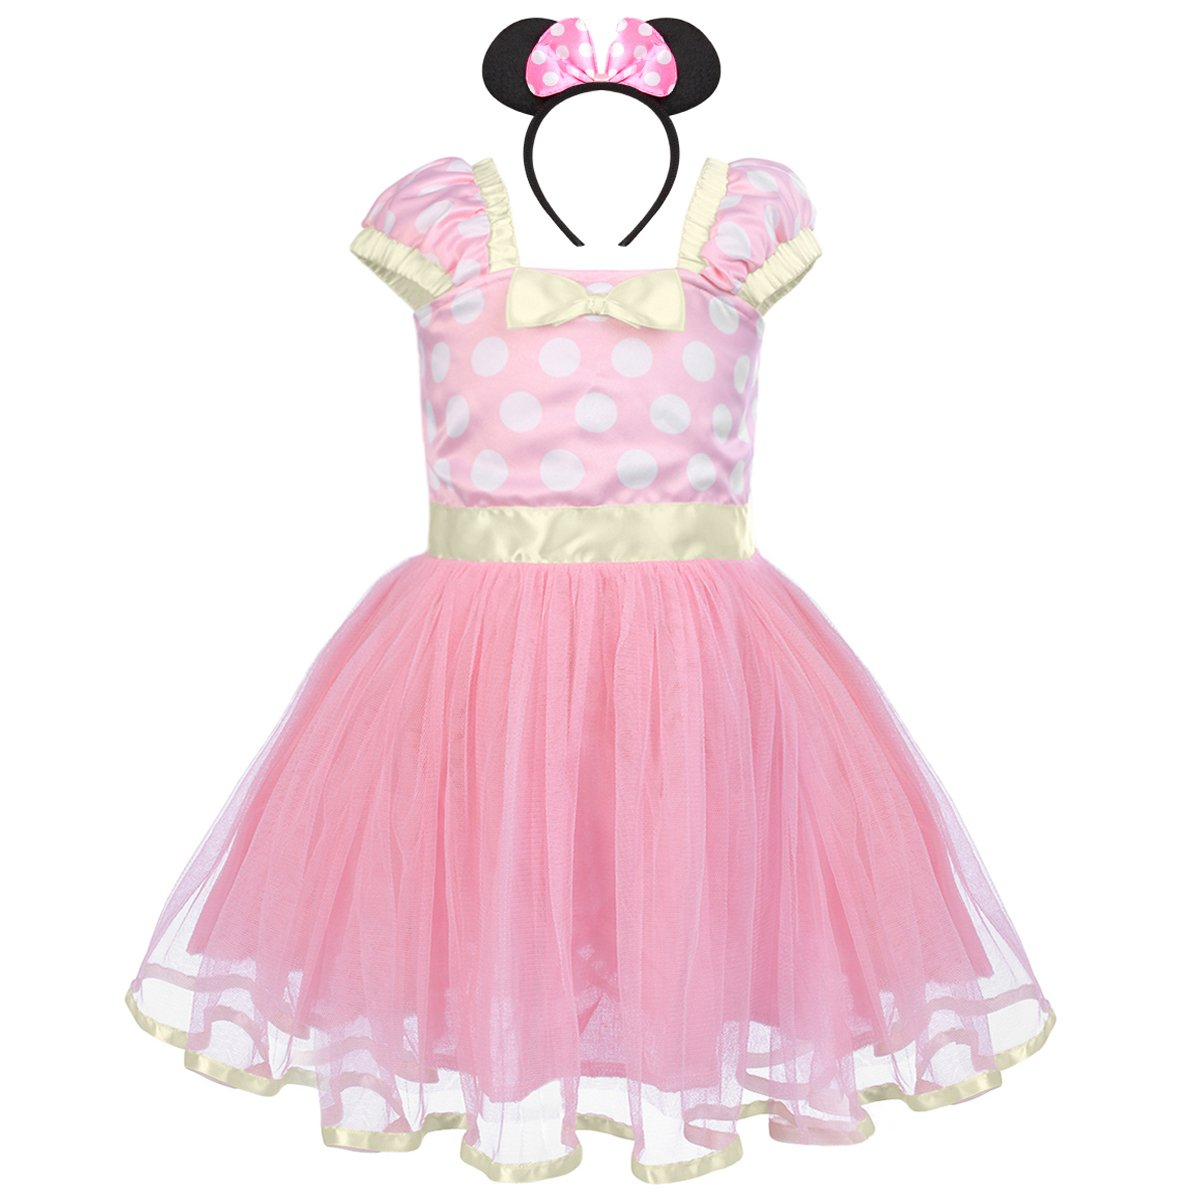 IWEMEK Toddler Girl Princess Polka Dots Christmas Birthday Costume Bowknot Ballet Leotard Tutu Dress Up+3D Mouse Ear Headband